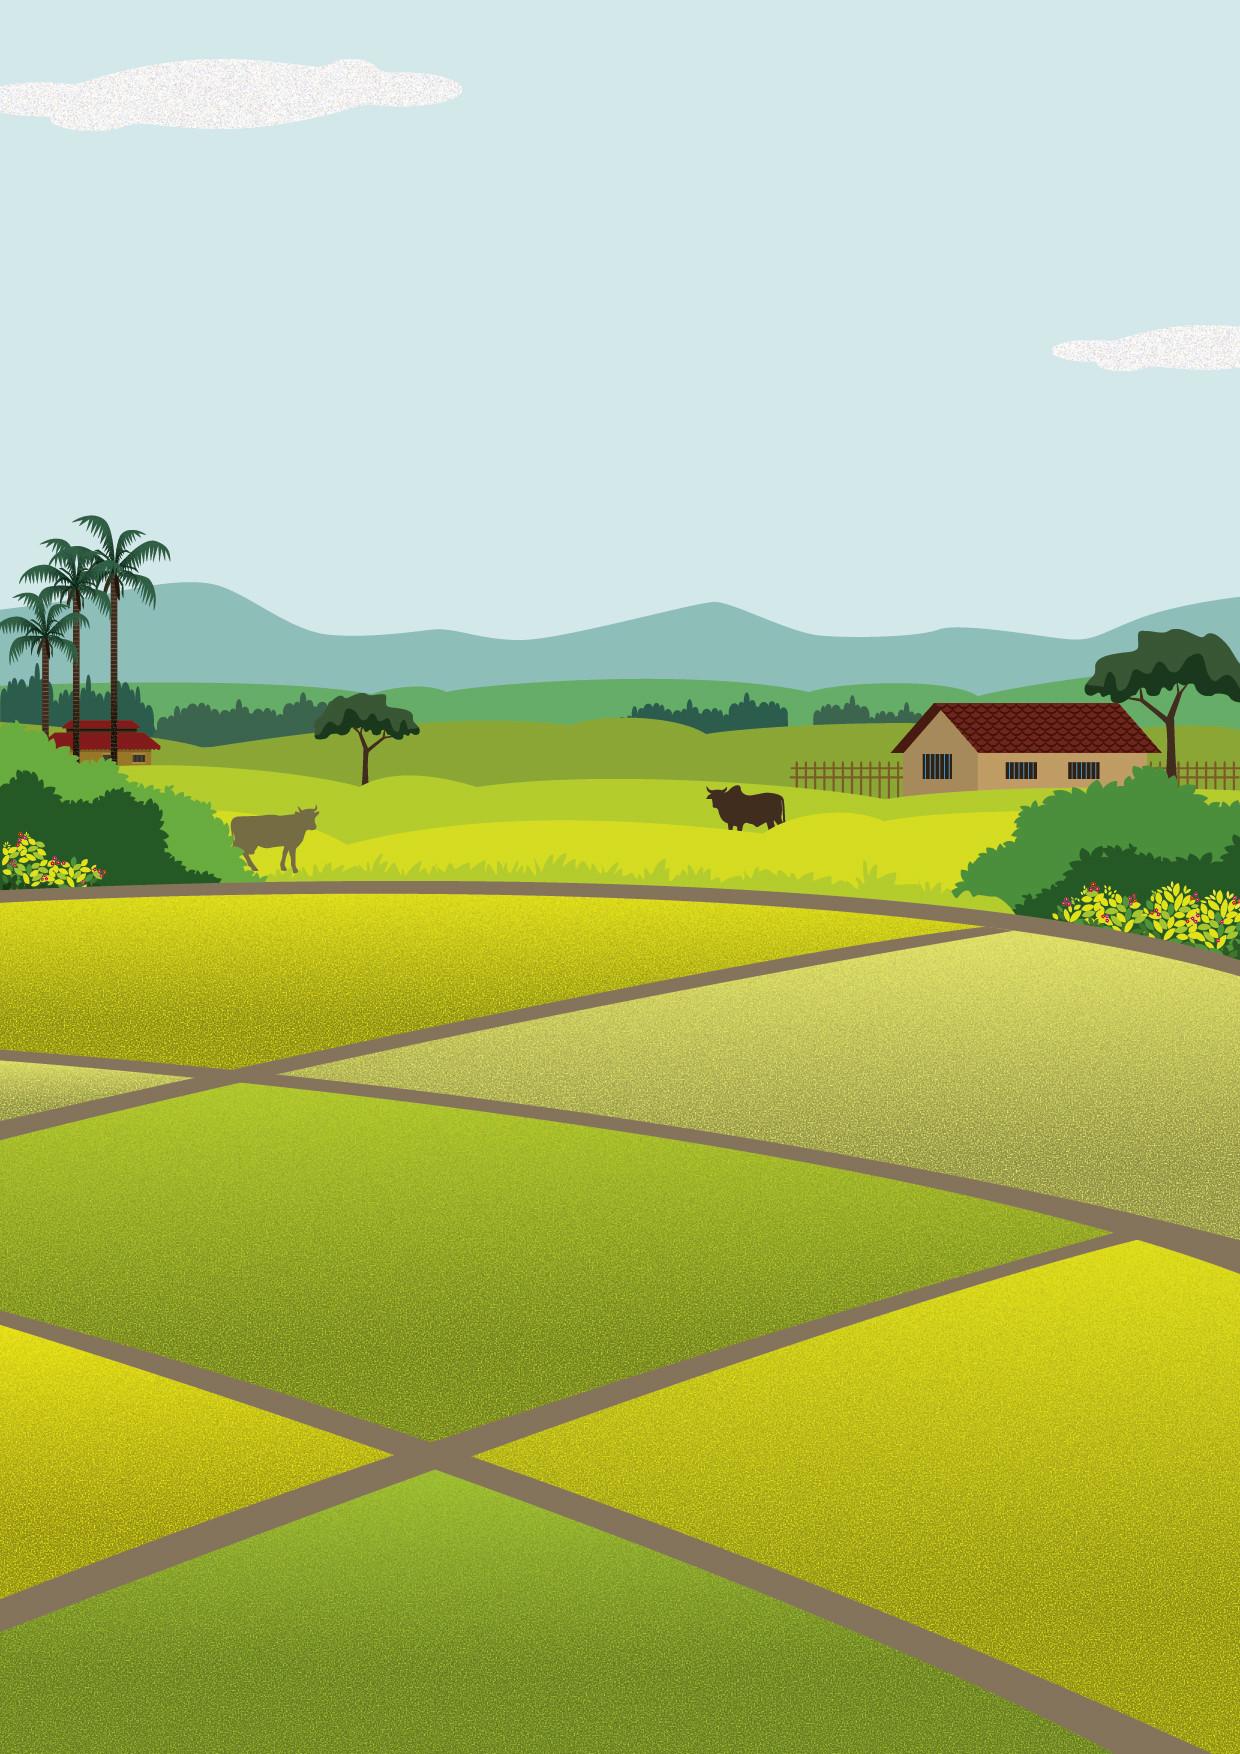 Rajesh r sawant komkan farming 01